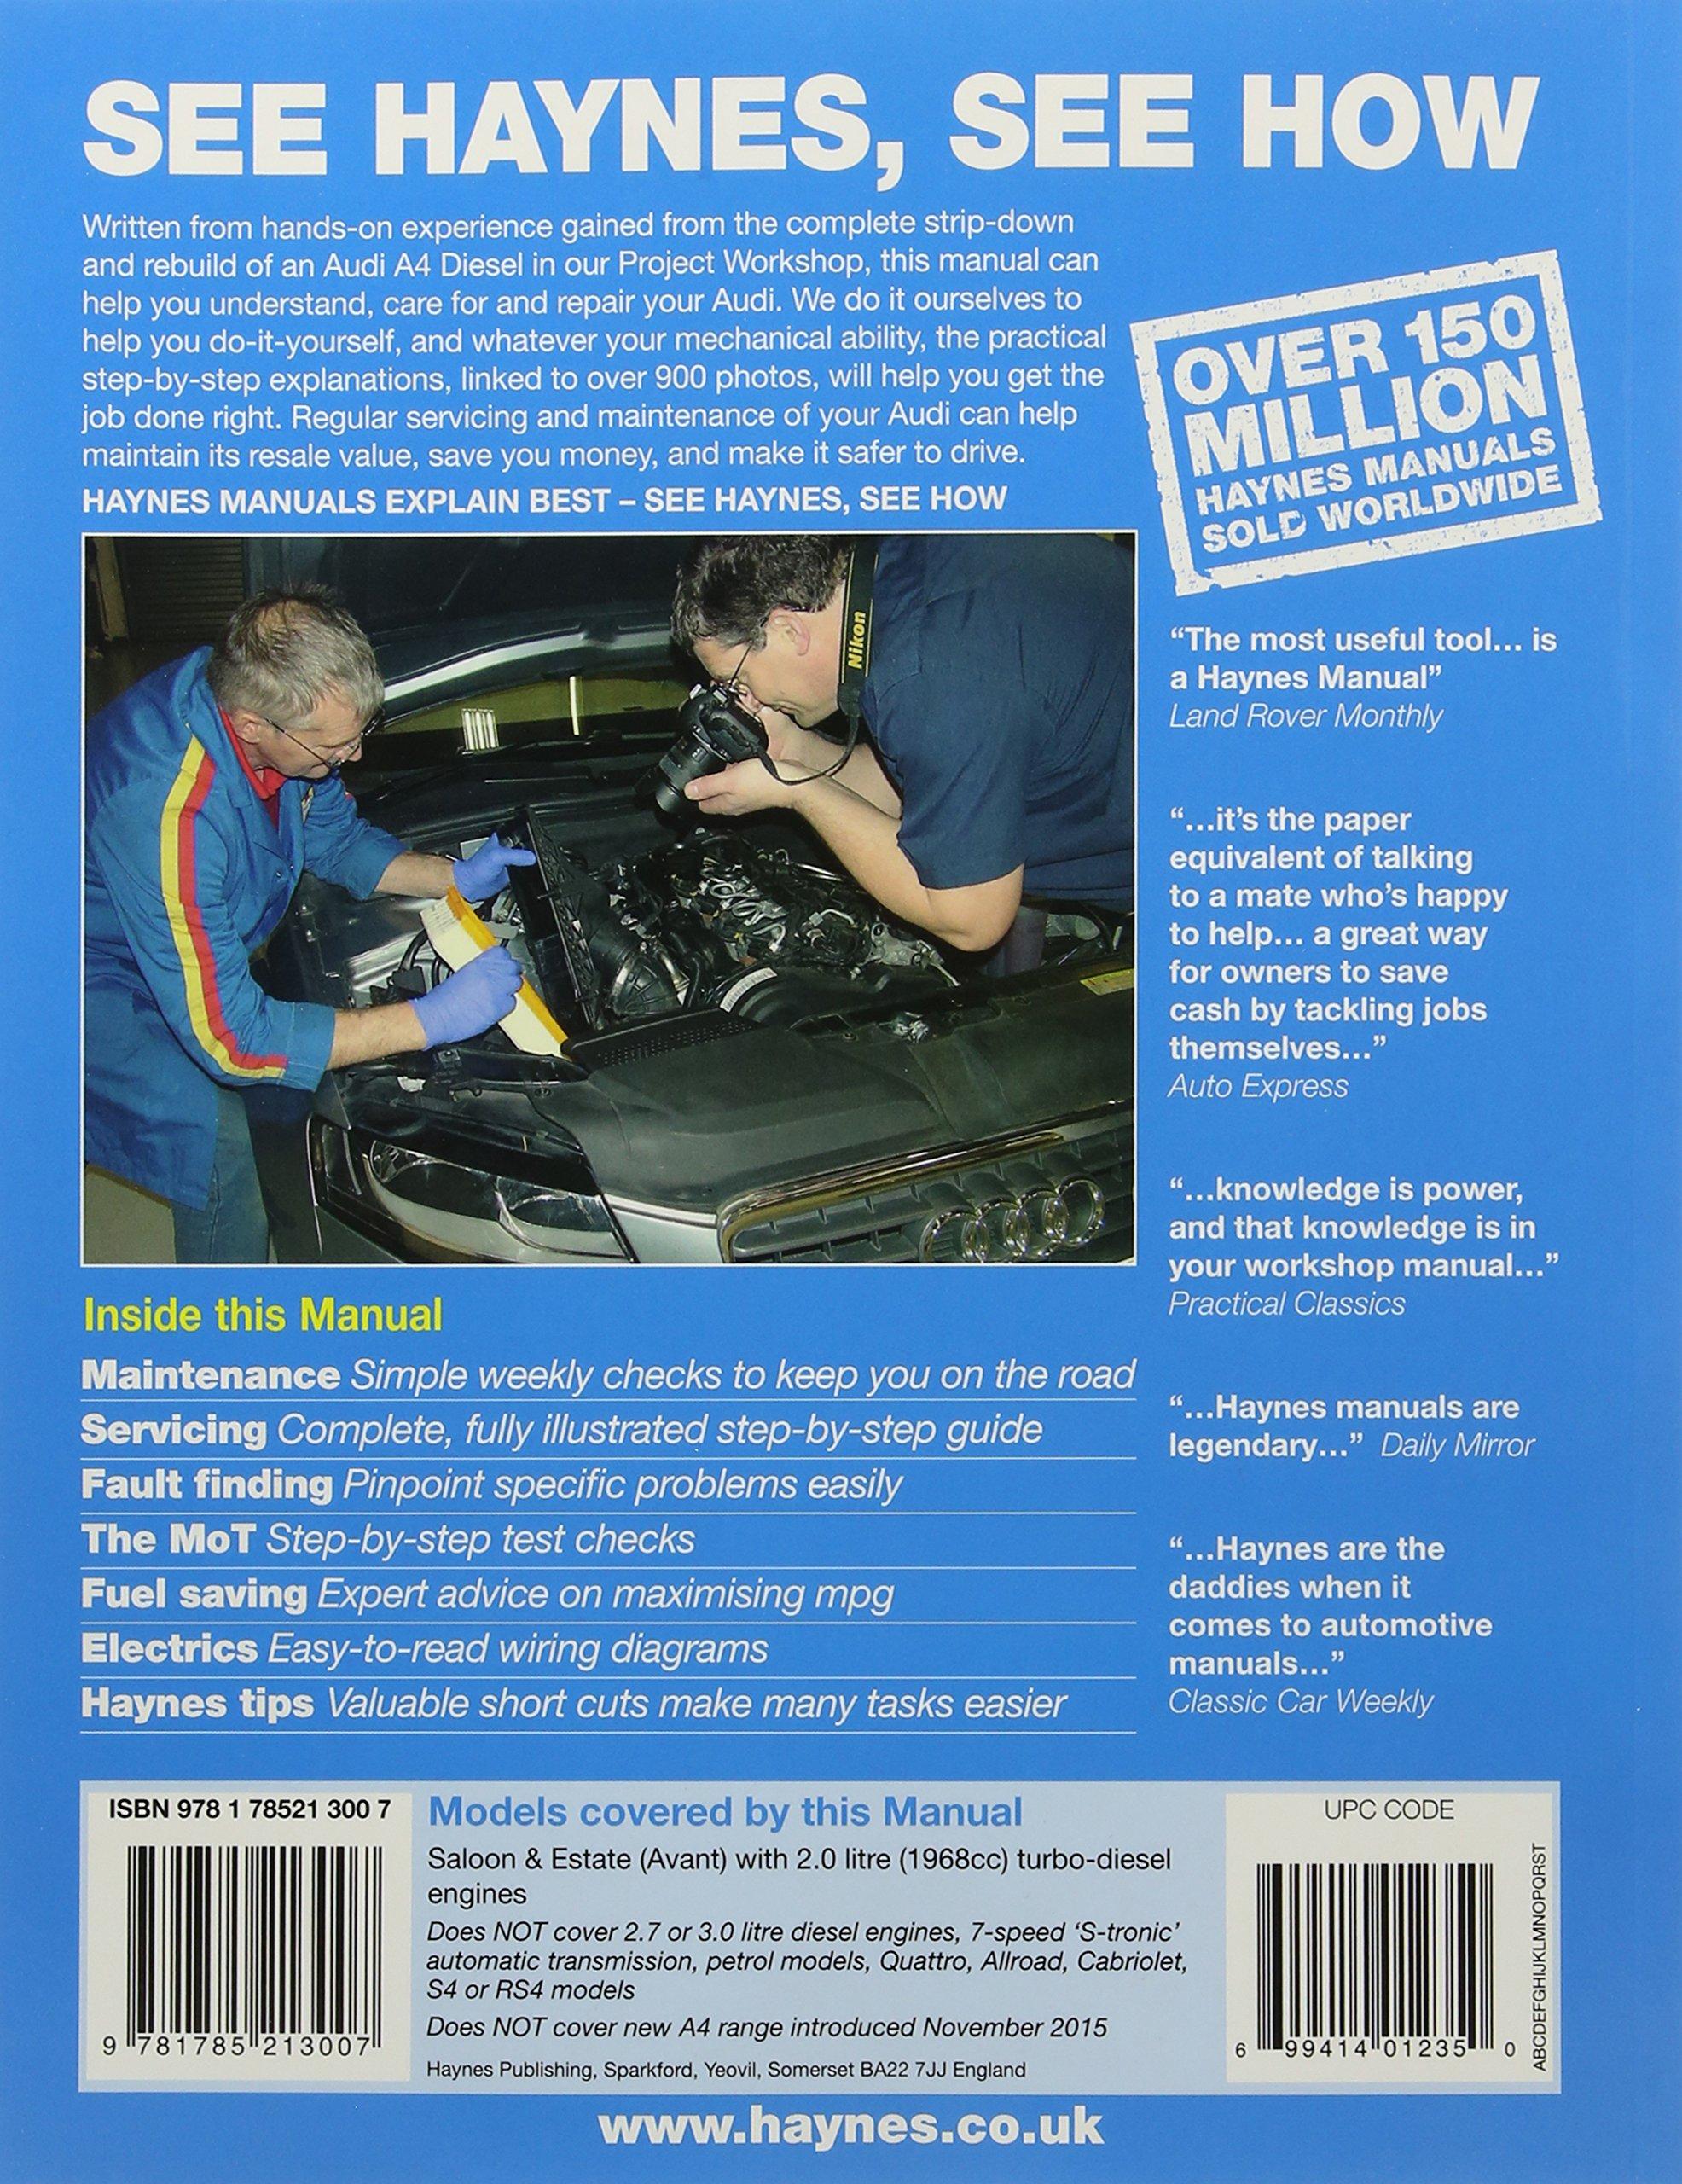 Audi A4 Diesel Mar 08 Oct 15 Haynes Repair Manual To 65 Reading Wiring Diagram Anon 9781785213007 Books